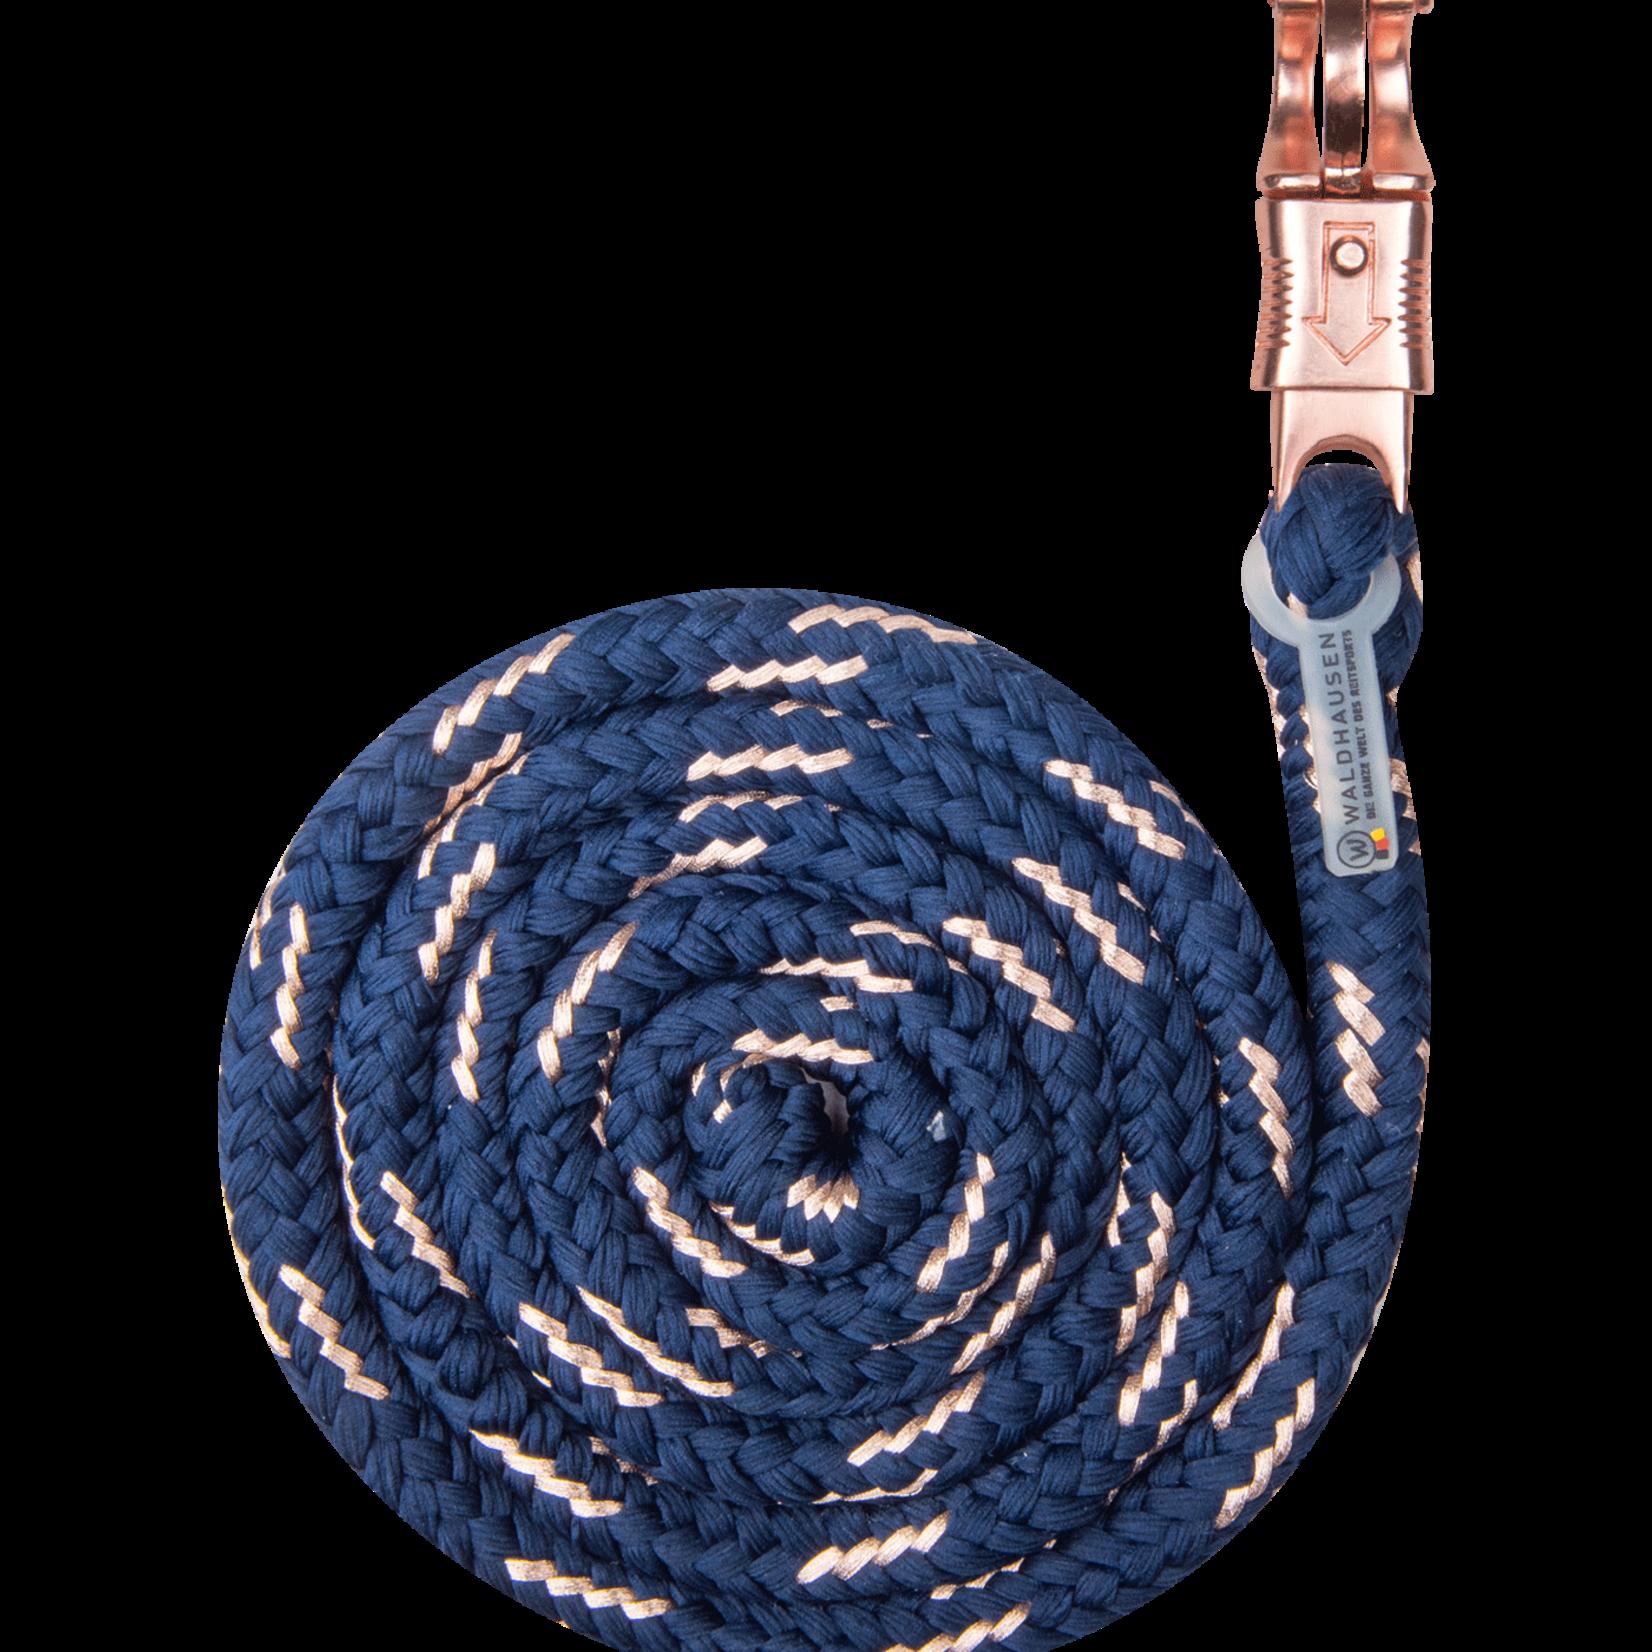 Waldhausen Rosé Lead Rope - Panic Hook